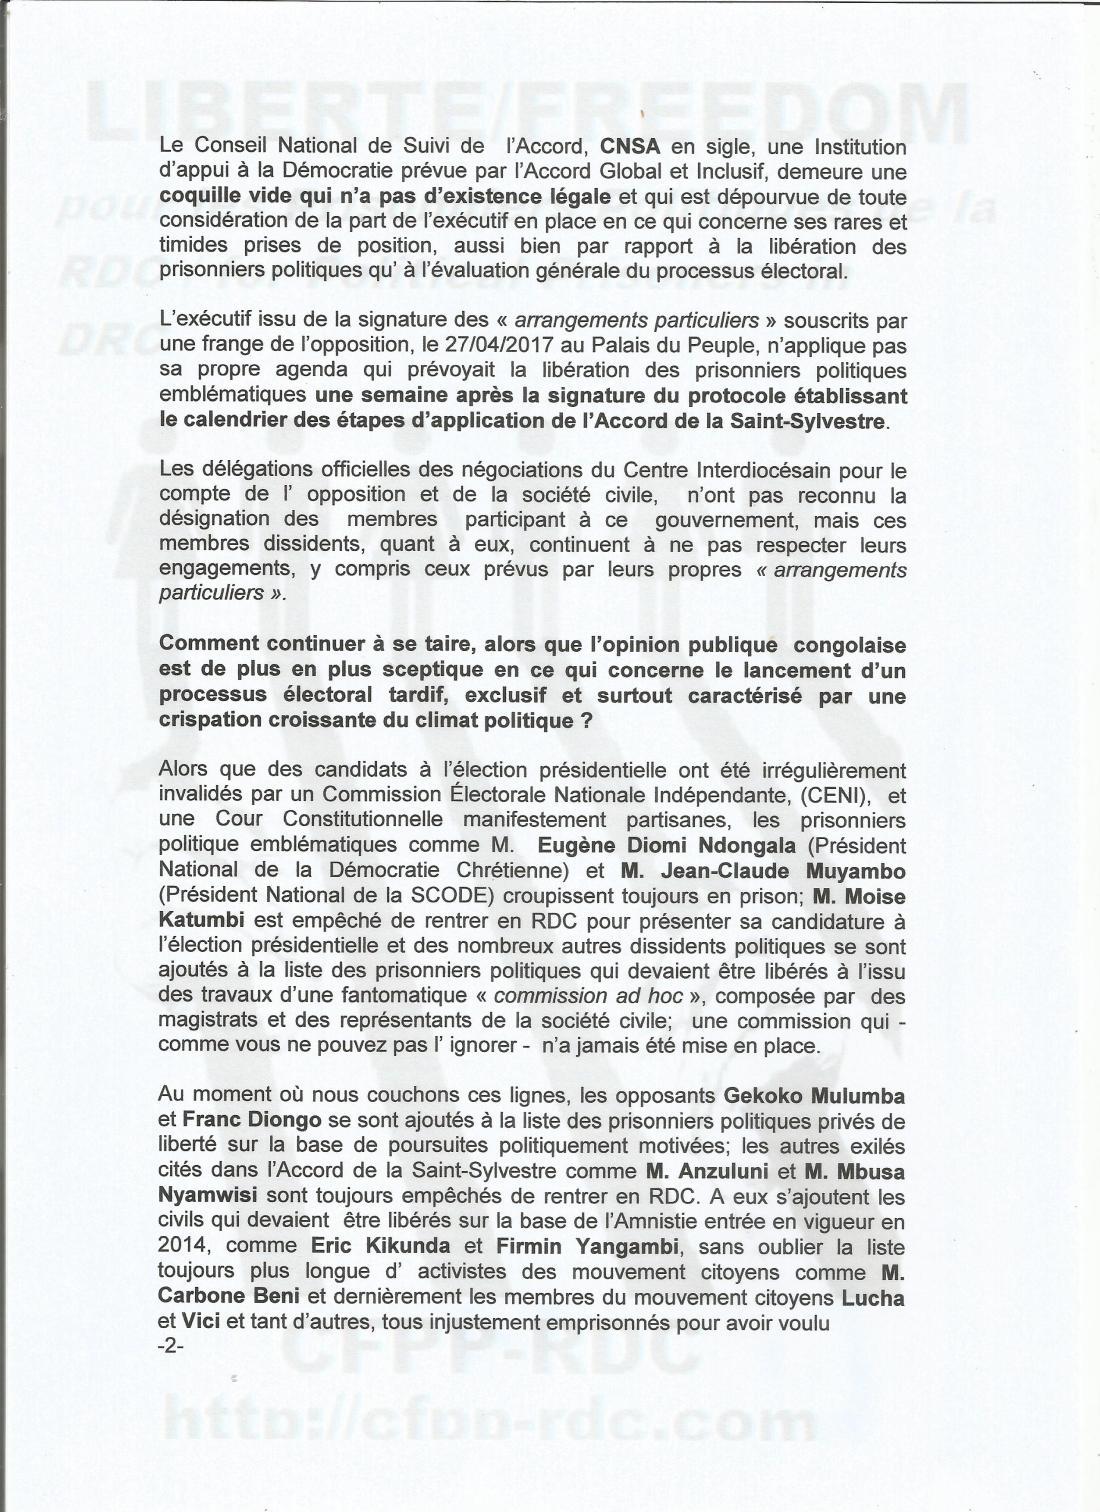 MEMORANDUM A LA CENCO 14.11.180002